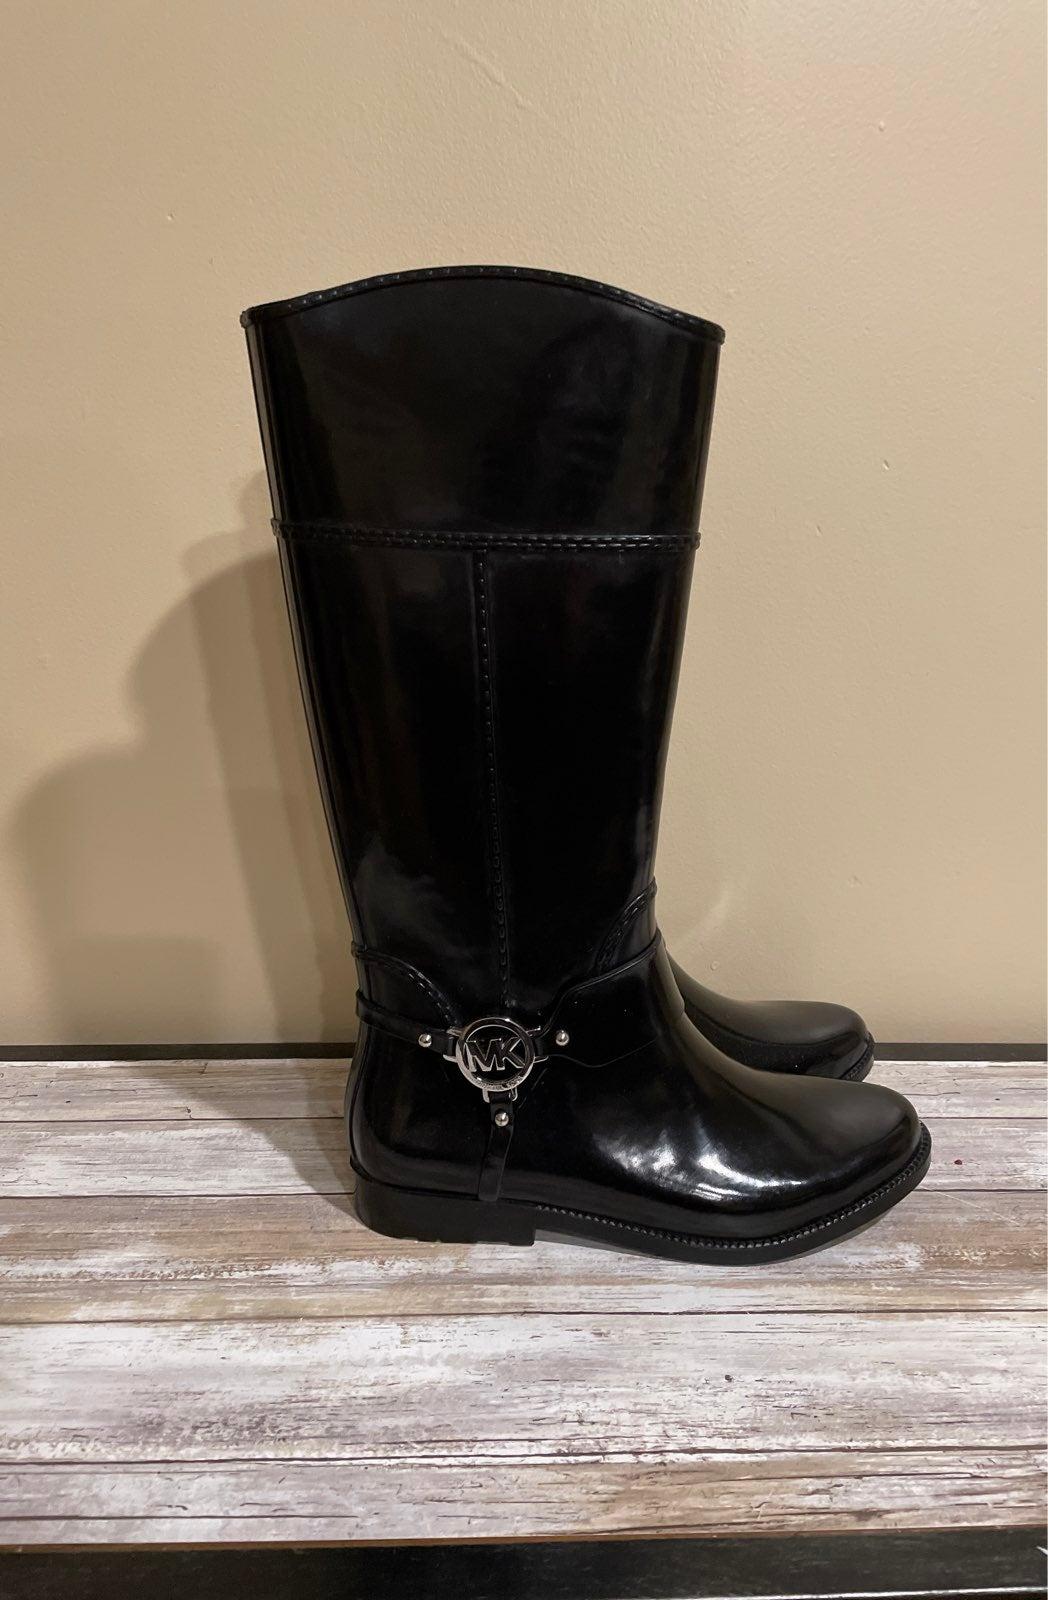 Michael Kors Rain Boots Size 10